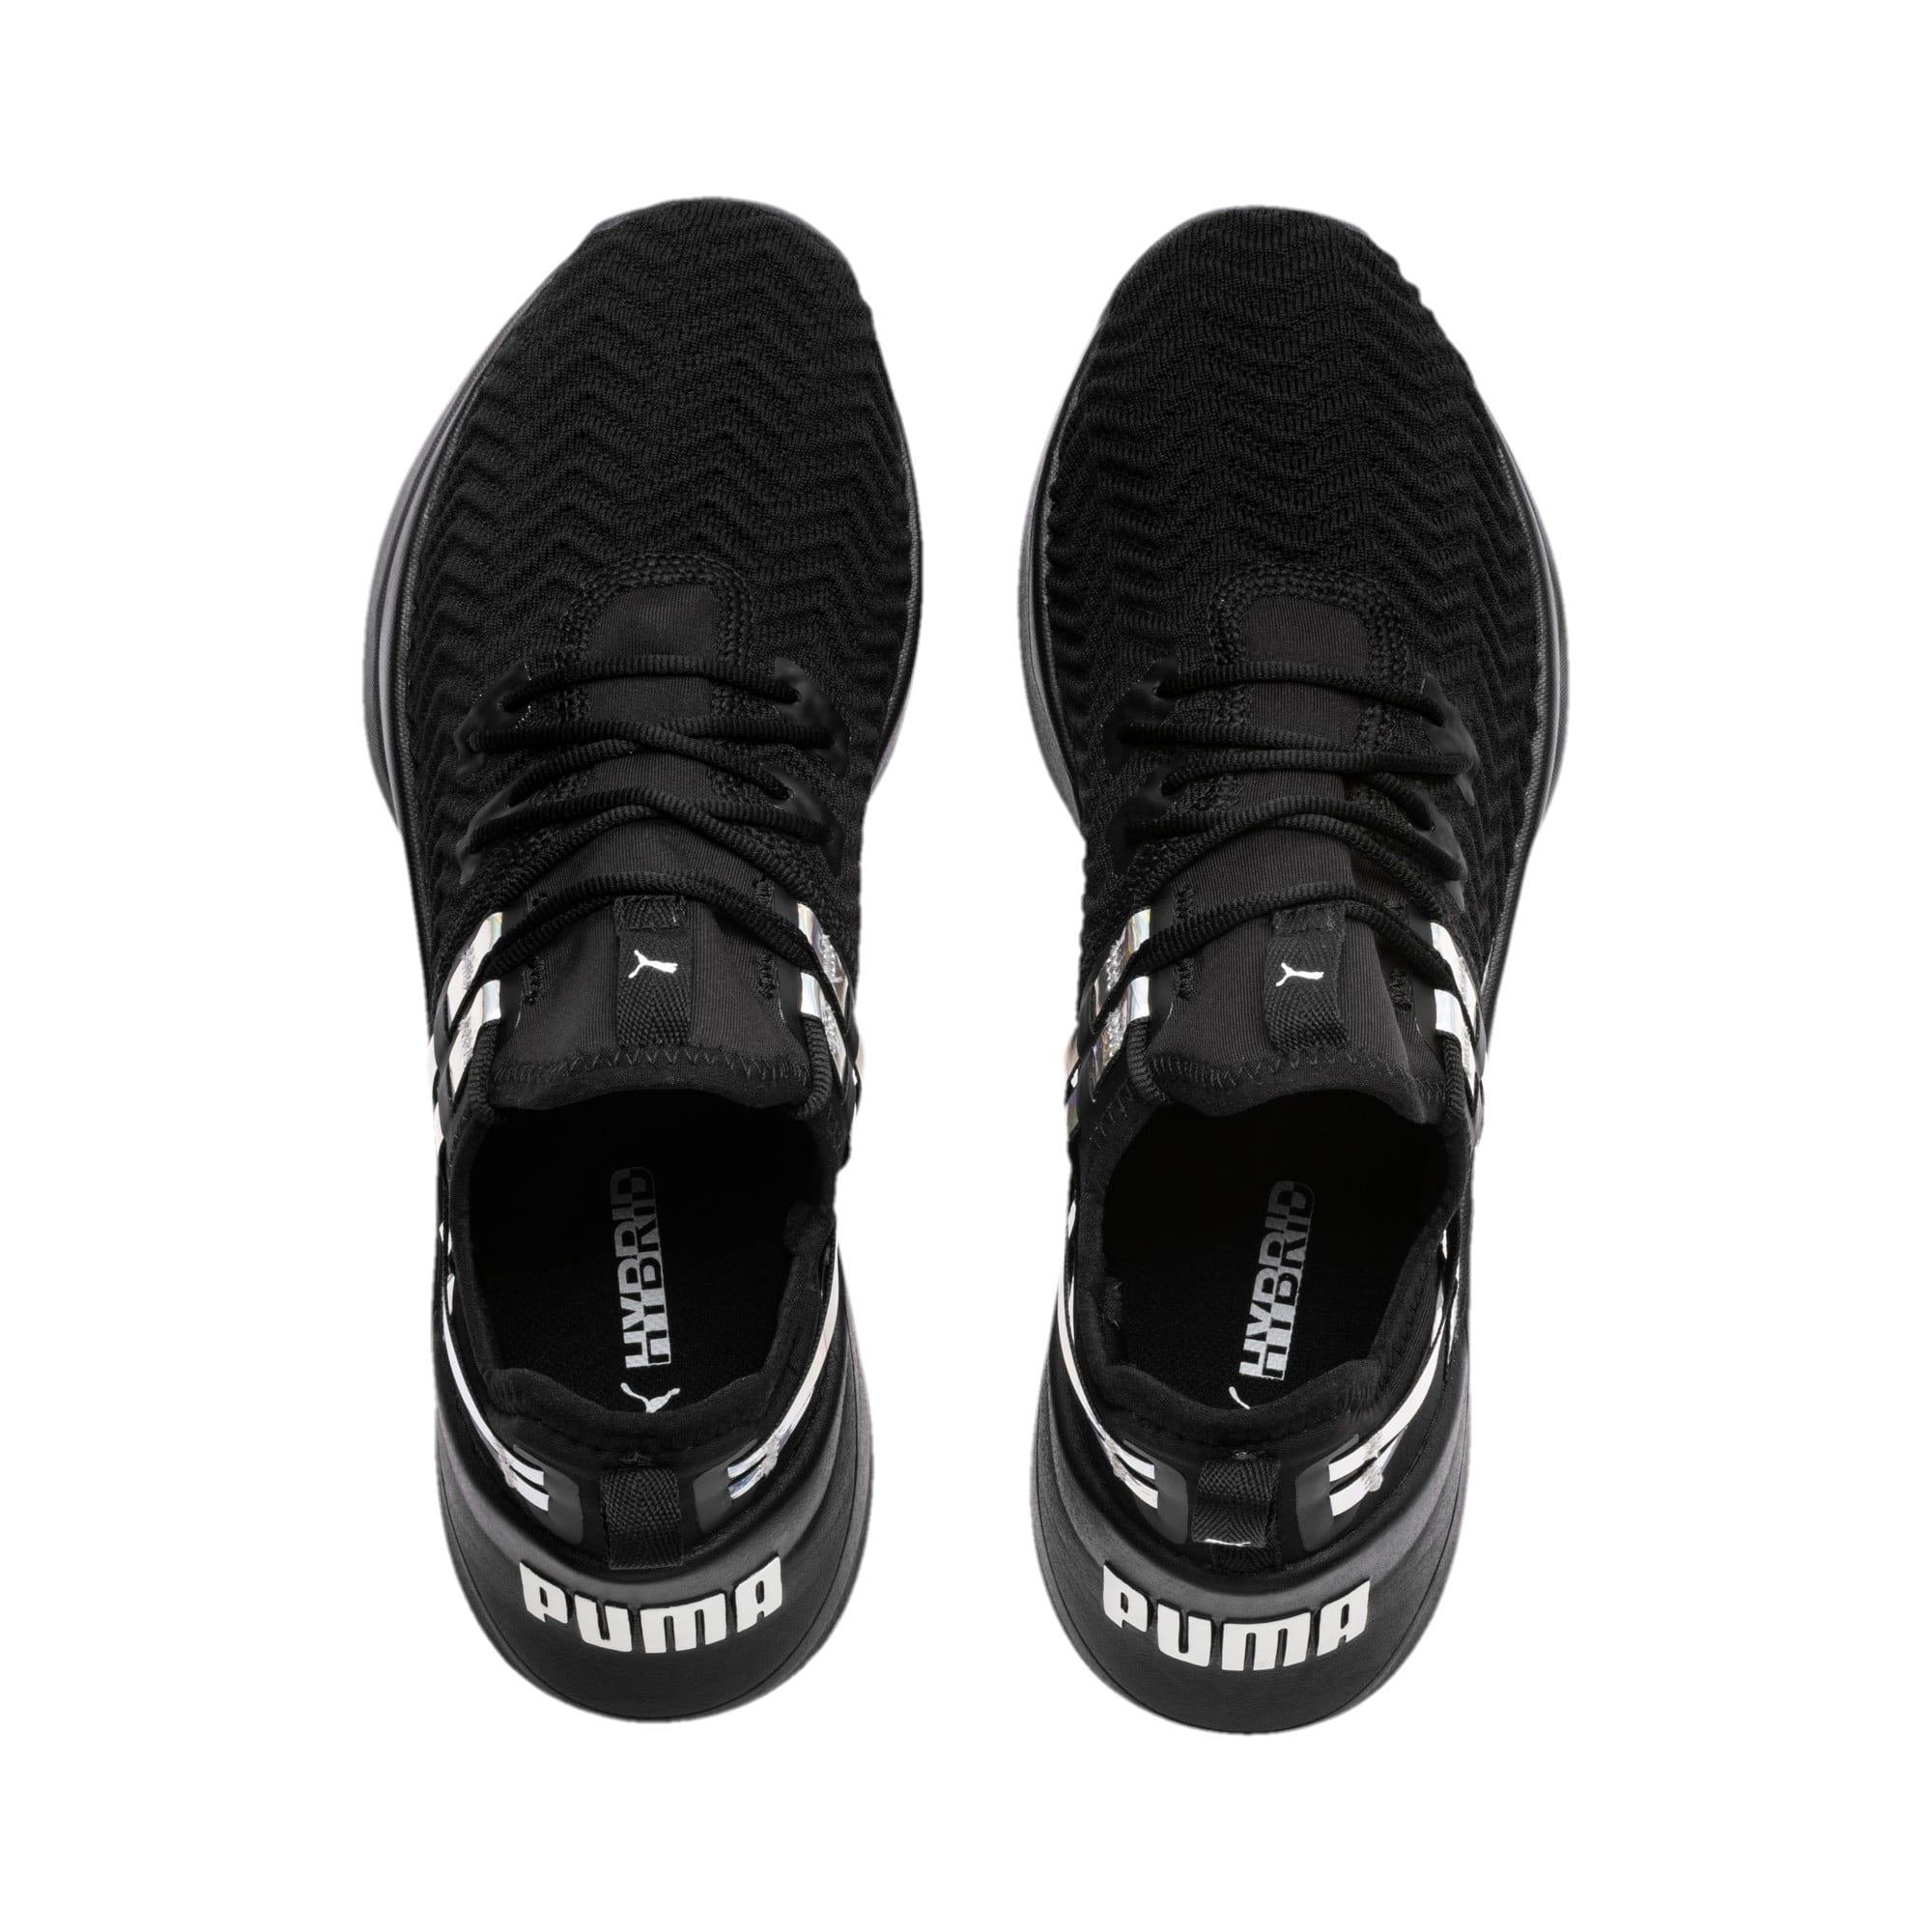 Thumbnail 7 of Jaab XT Iridescent TZ Damen Trainingsschuhe, Puma Black-Puma Black, medium